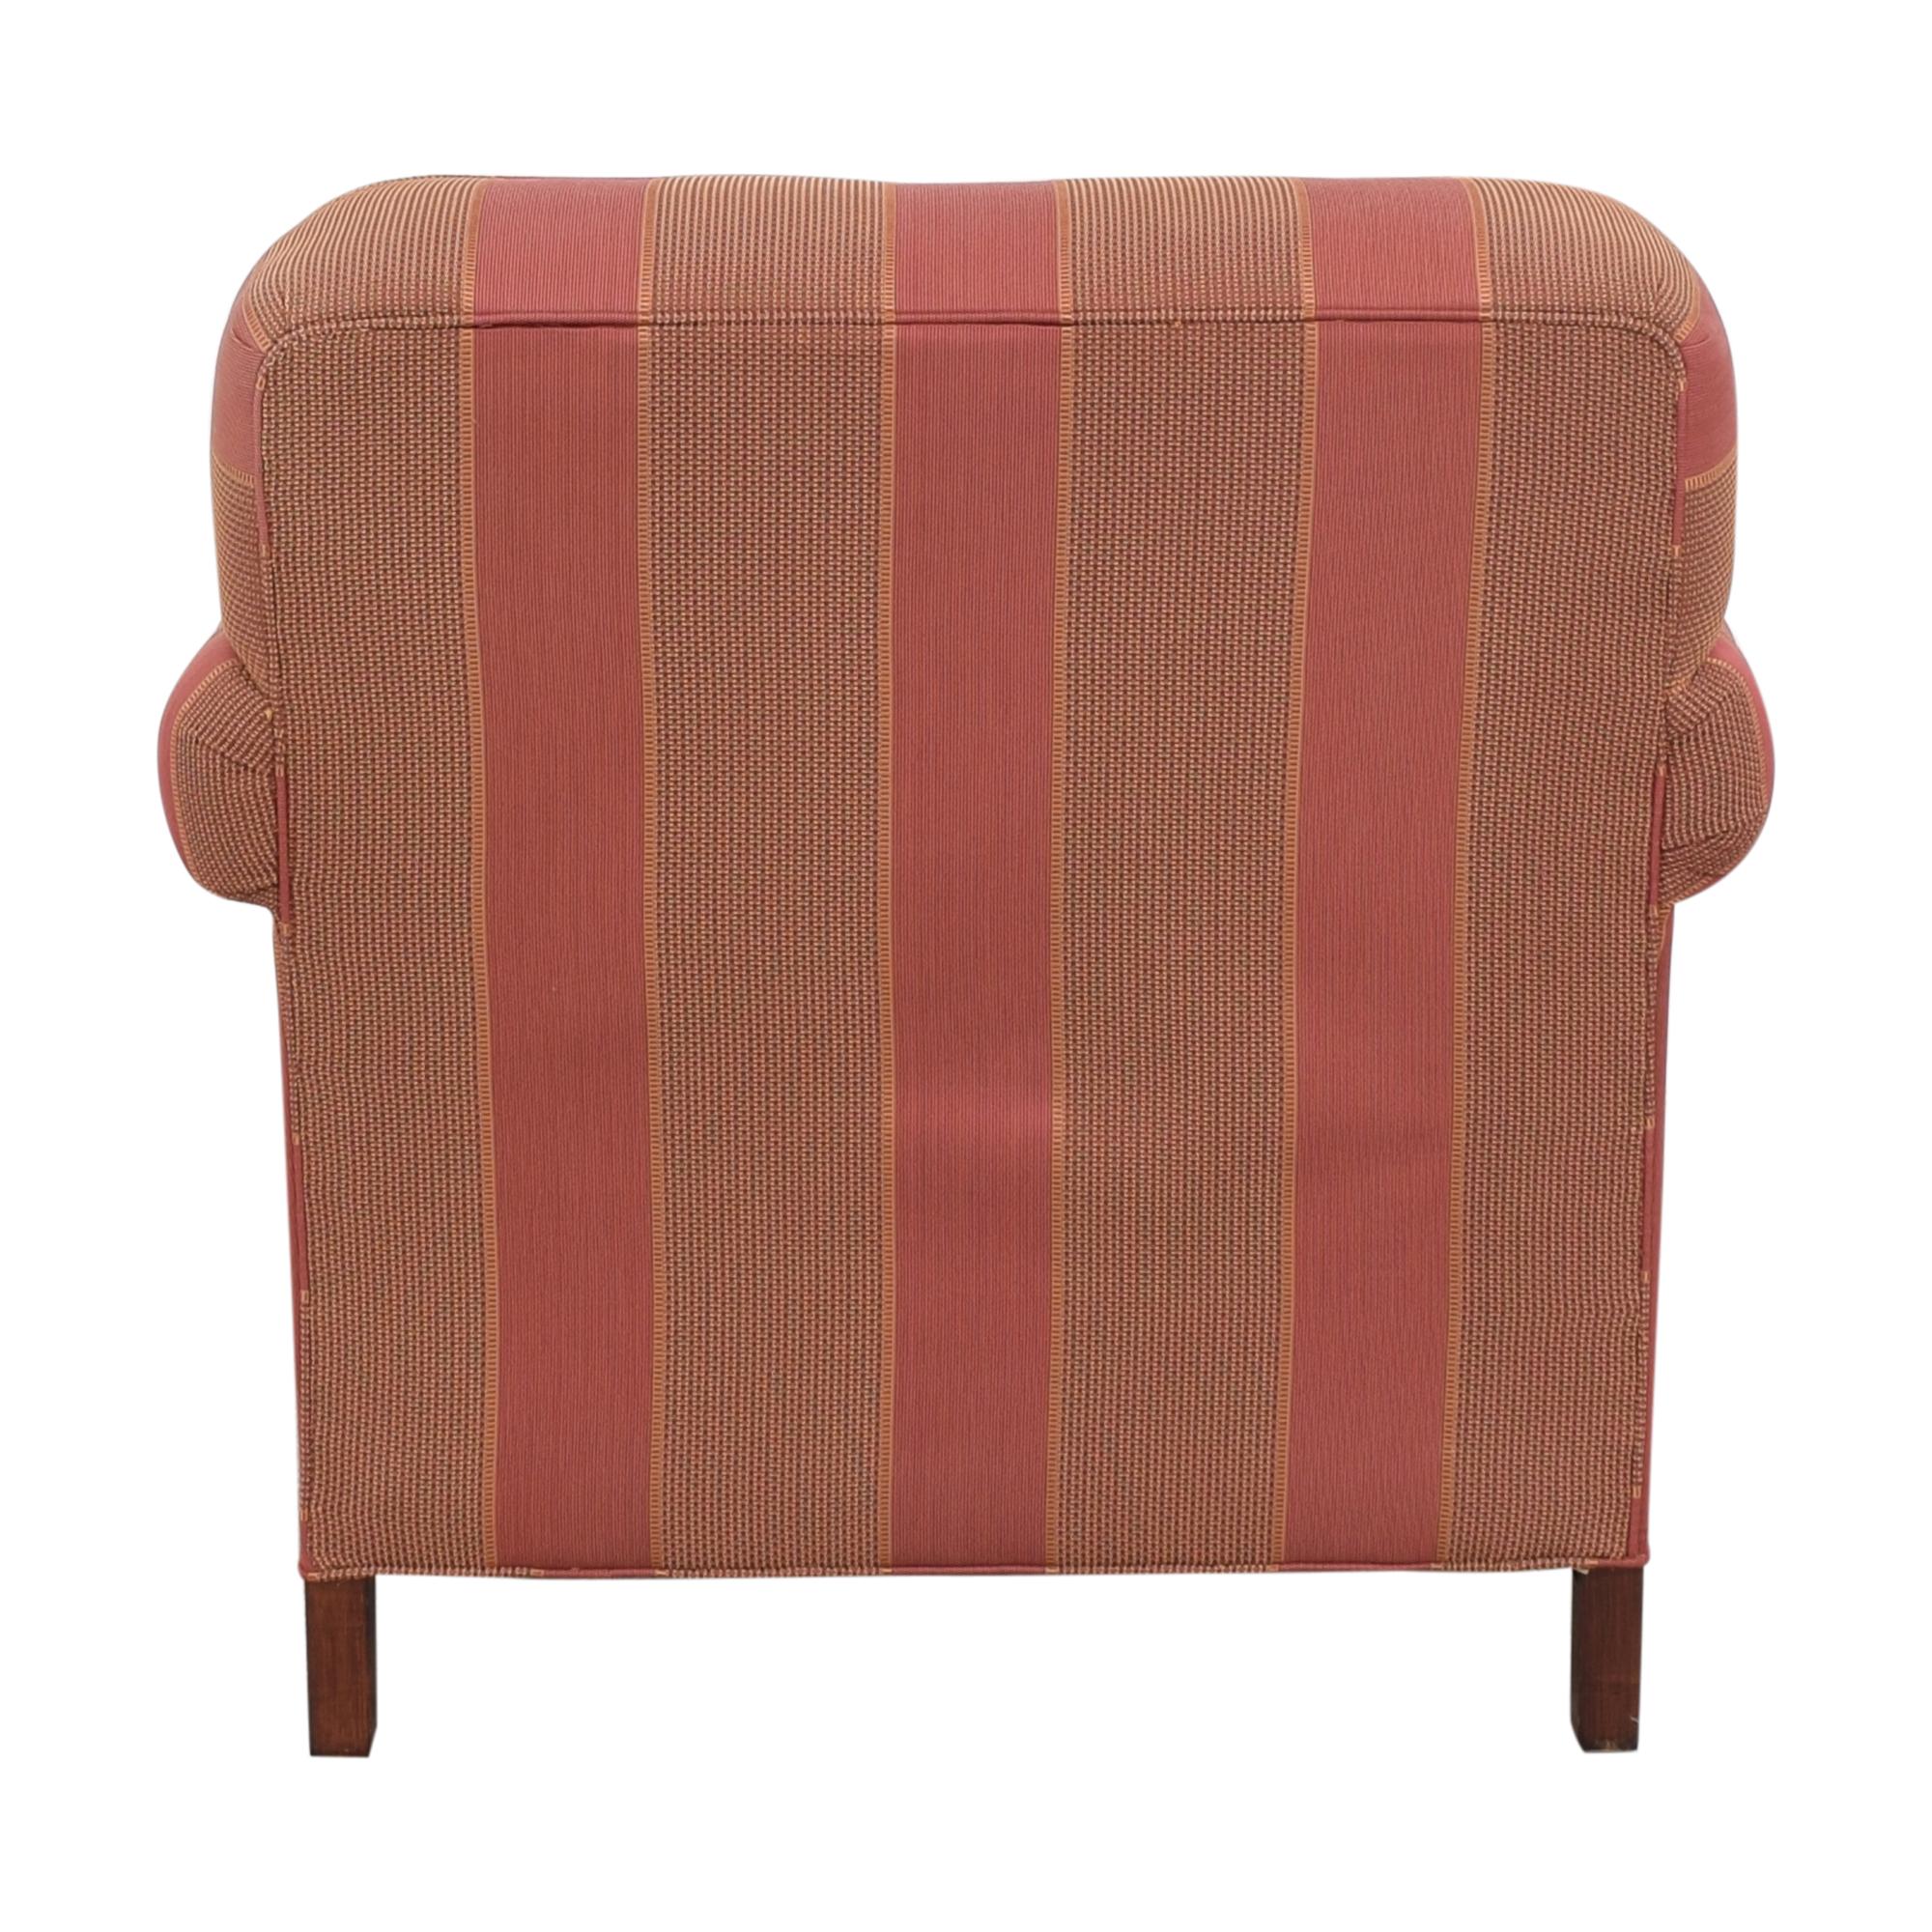 shop Grange Striped Chair with Ottoman Grange